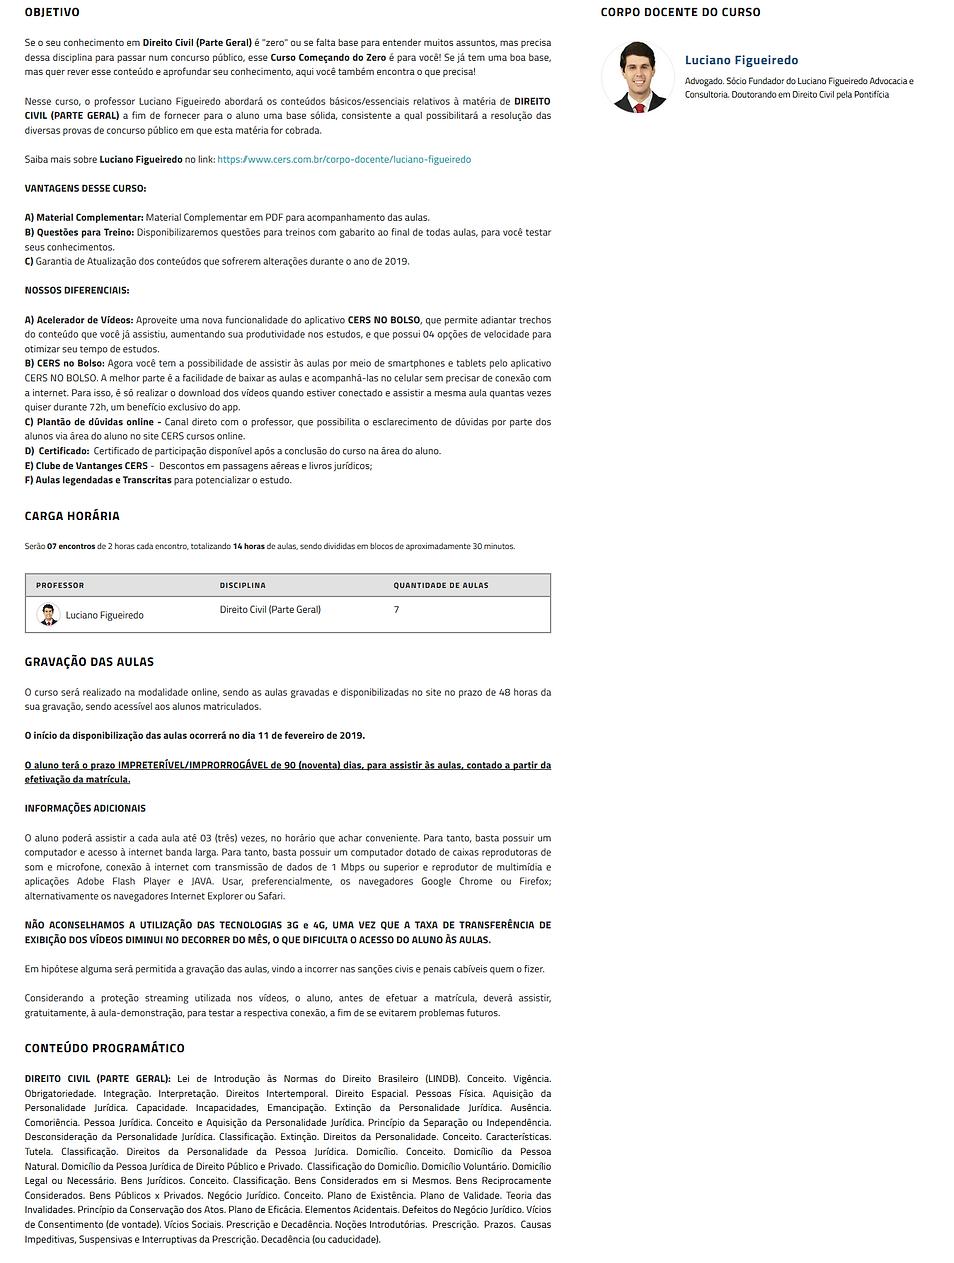 Direito Civil (Parte Geral) CS(17).png